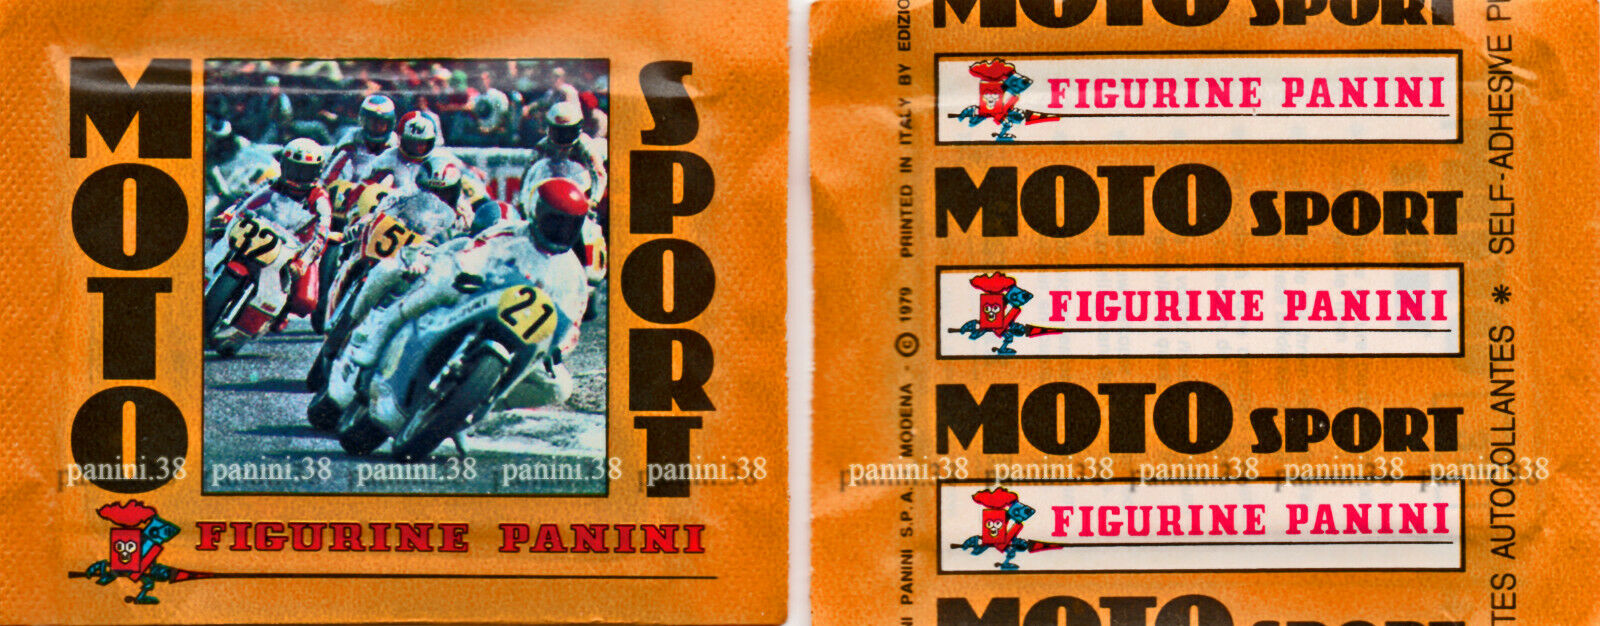 "Rare !! pochette ""moto sport 1979"" packet, tüte, bustina panini"